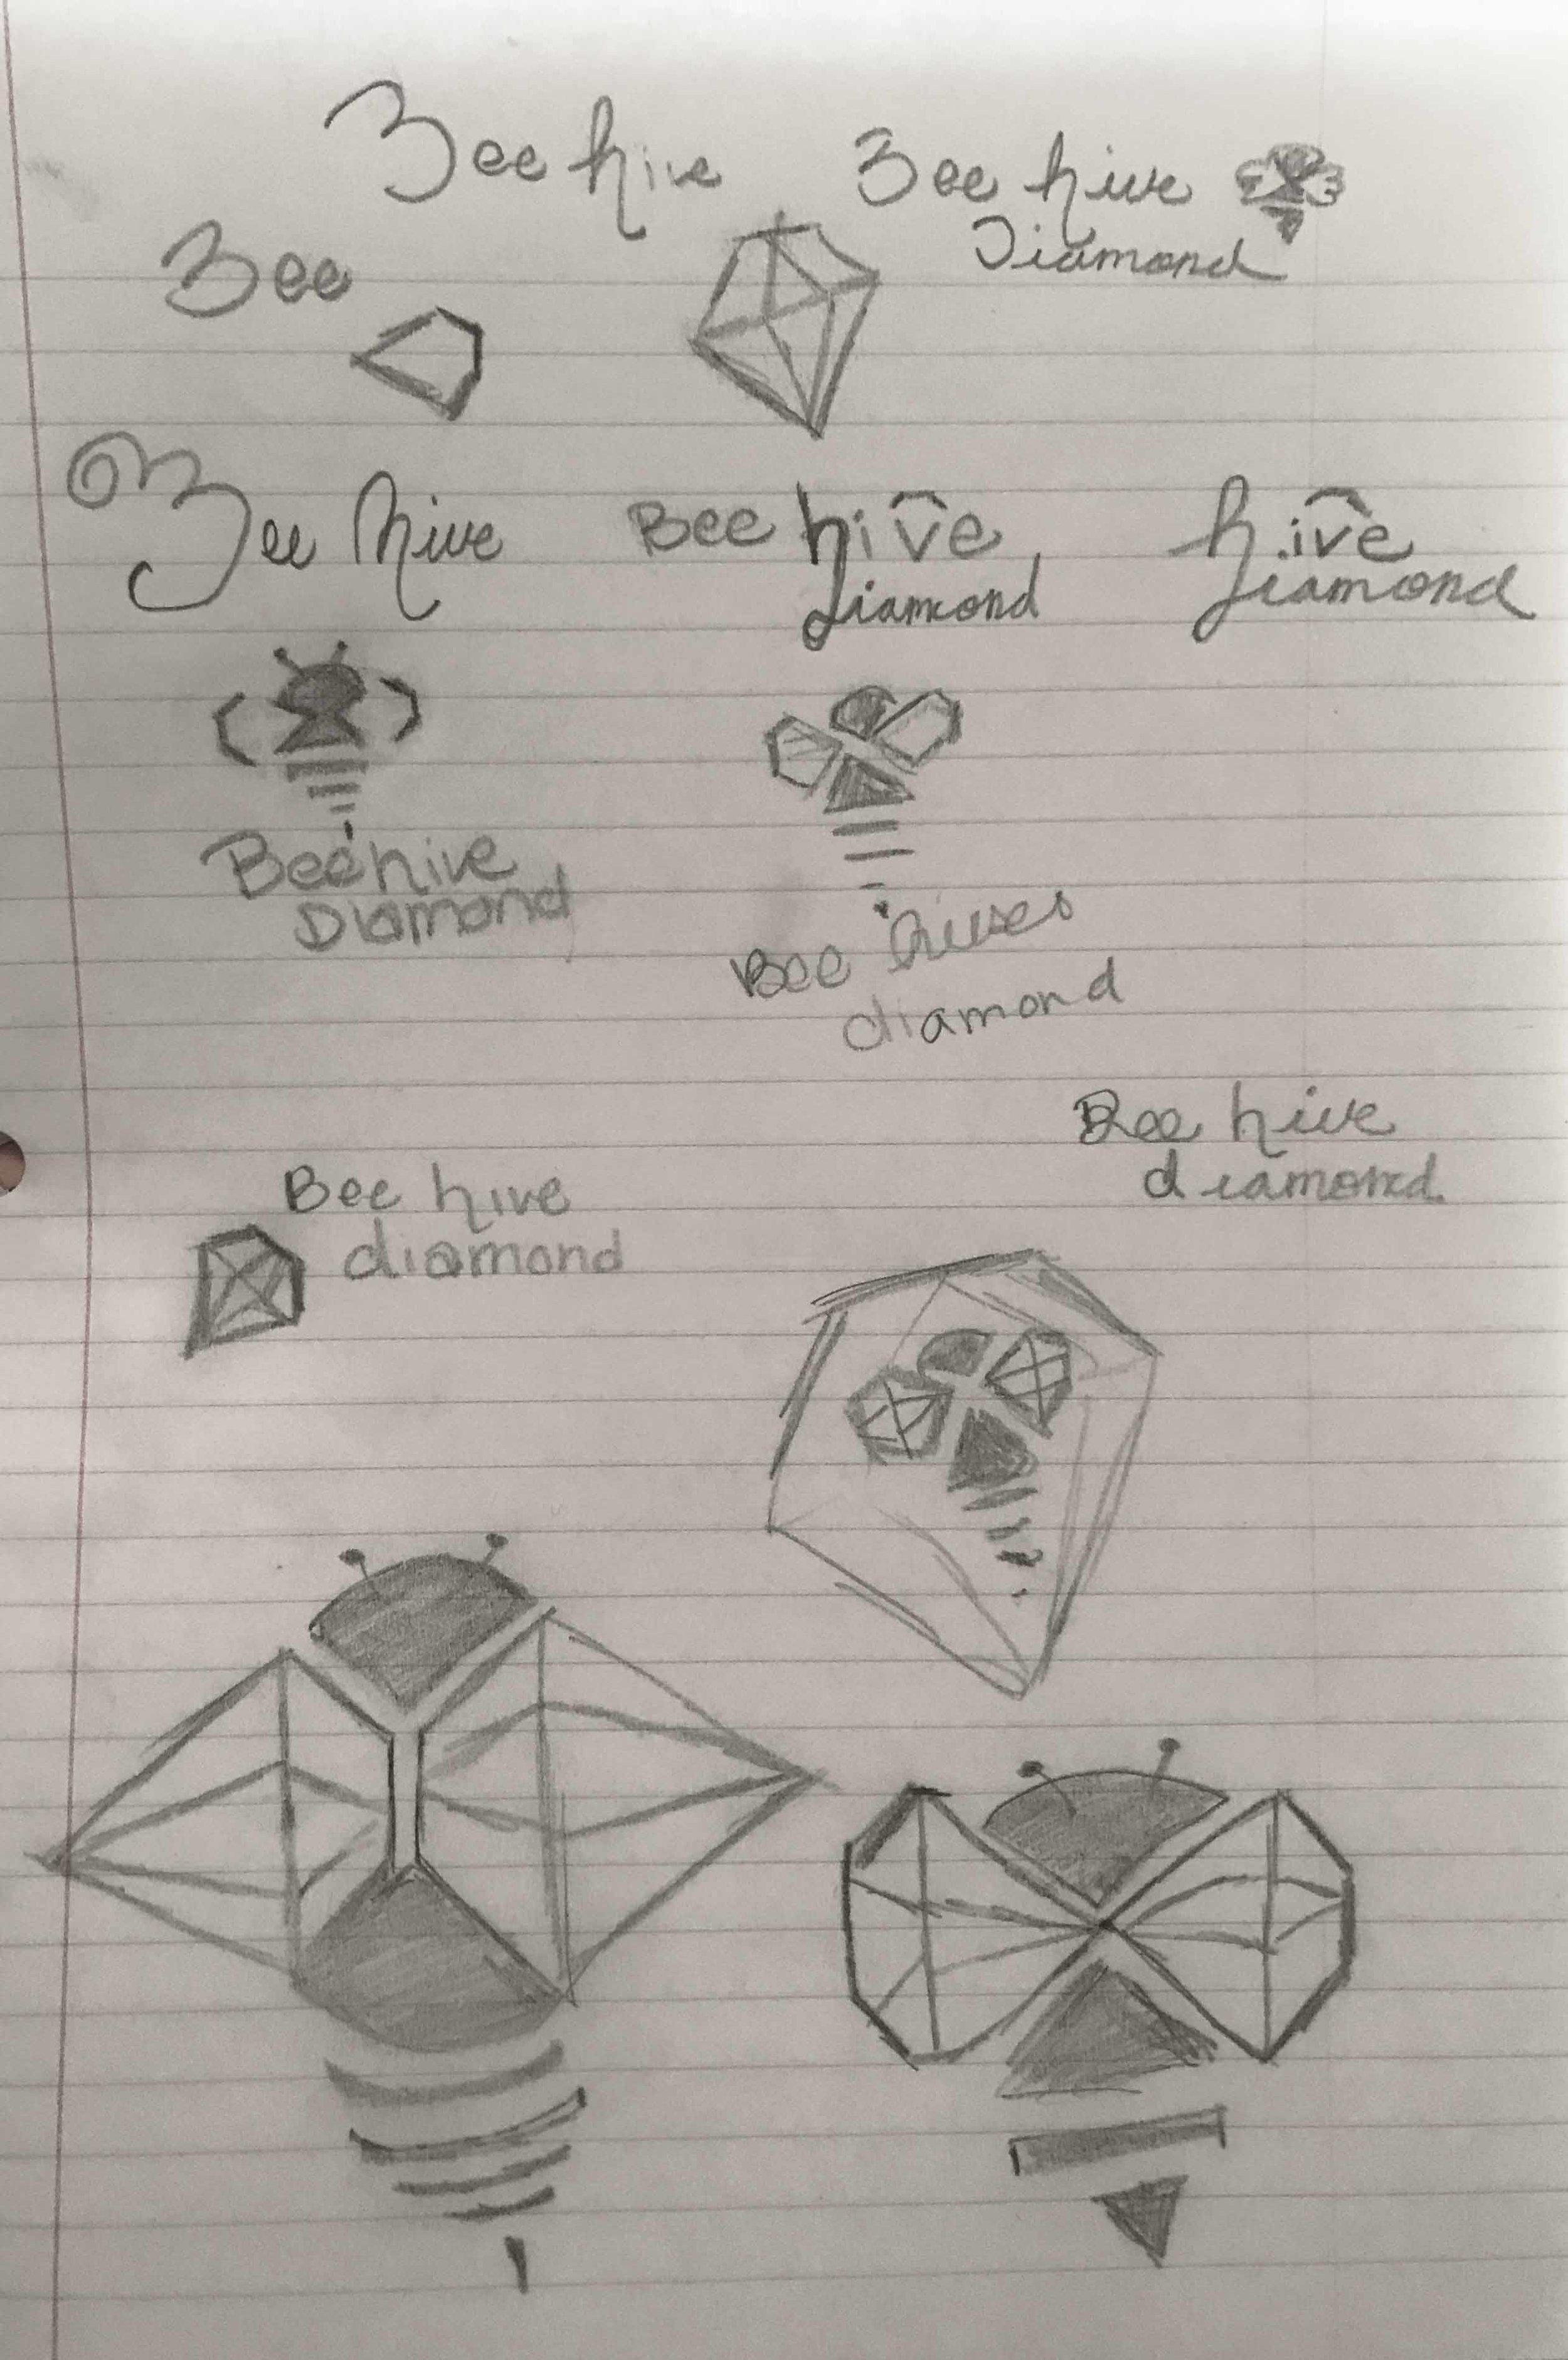 beehivediamondsketch.jpg